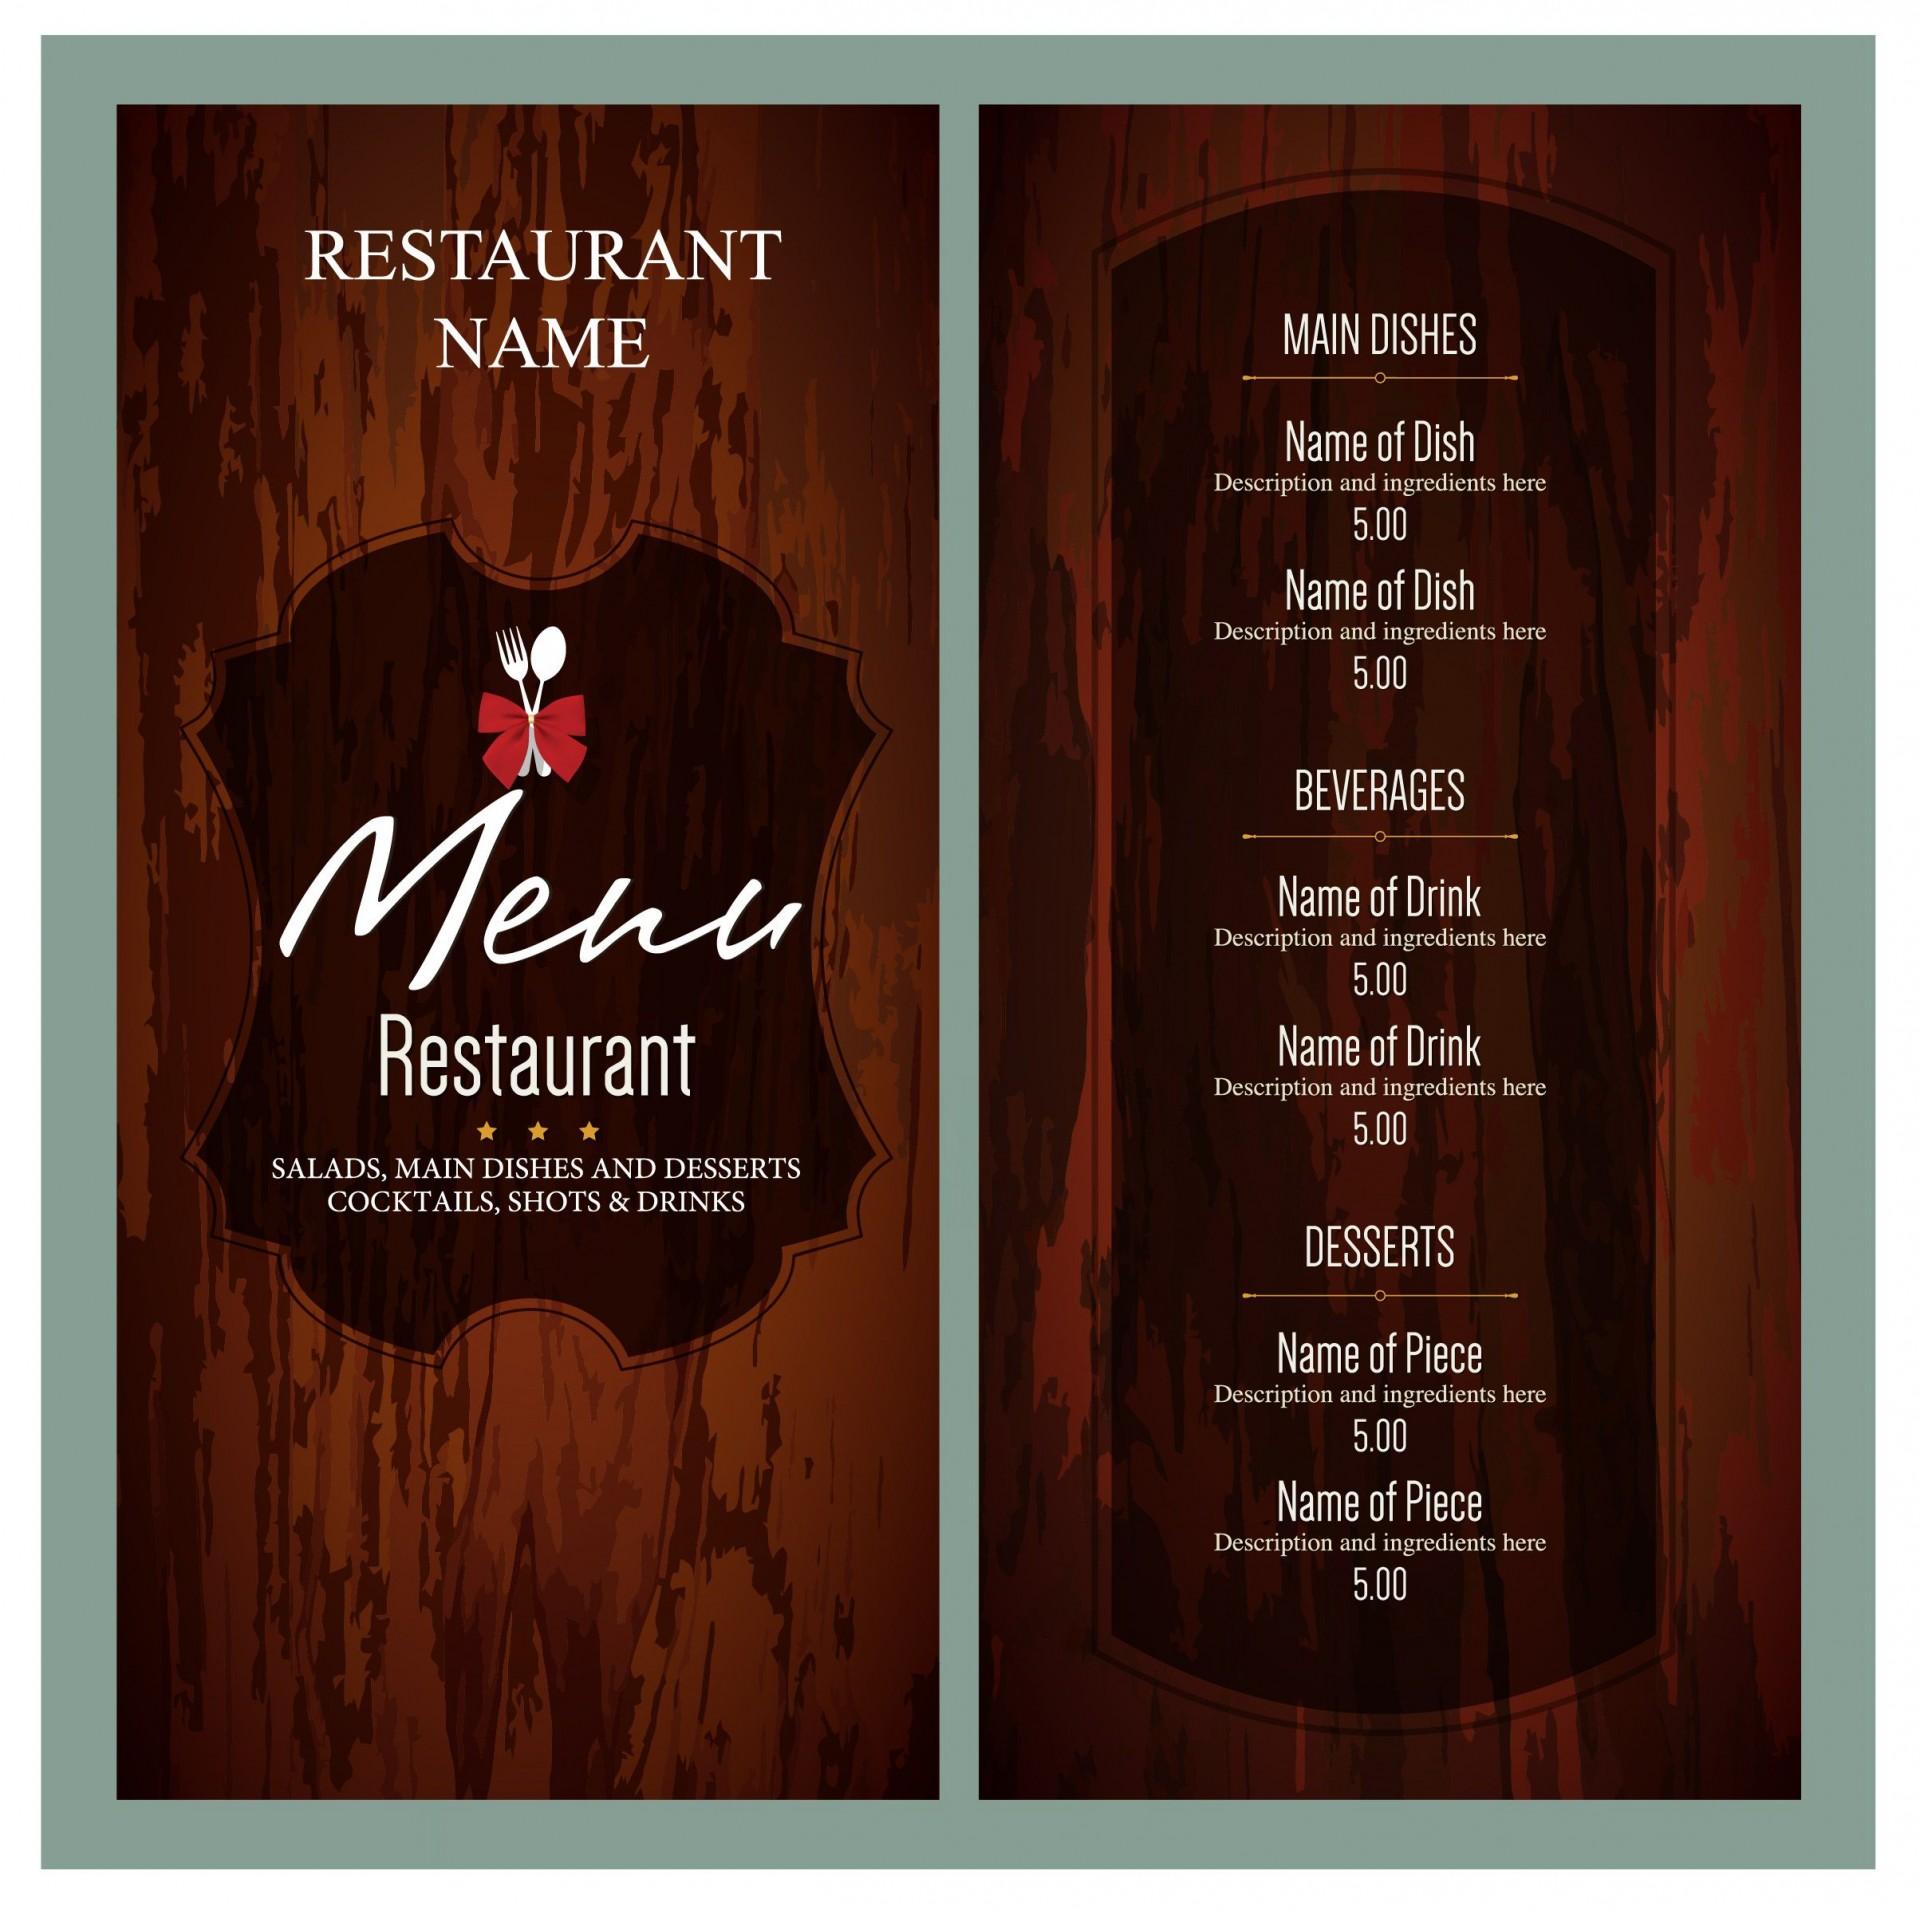 010 Unusual Free Menu Template Download High Resolution  Beauty Parlour Card Html Design Restaurant1920